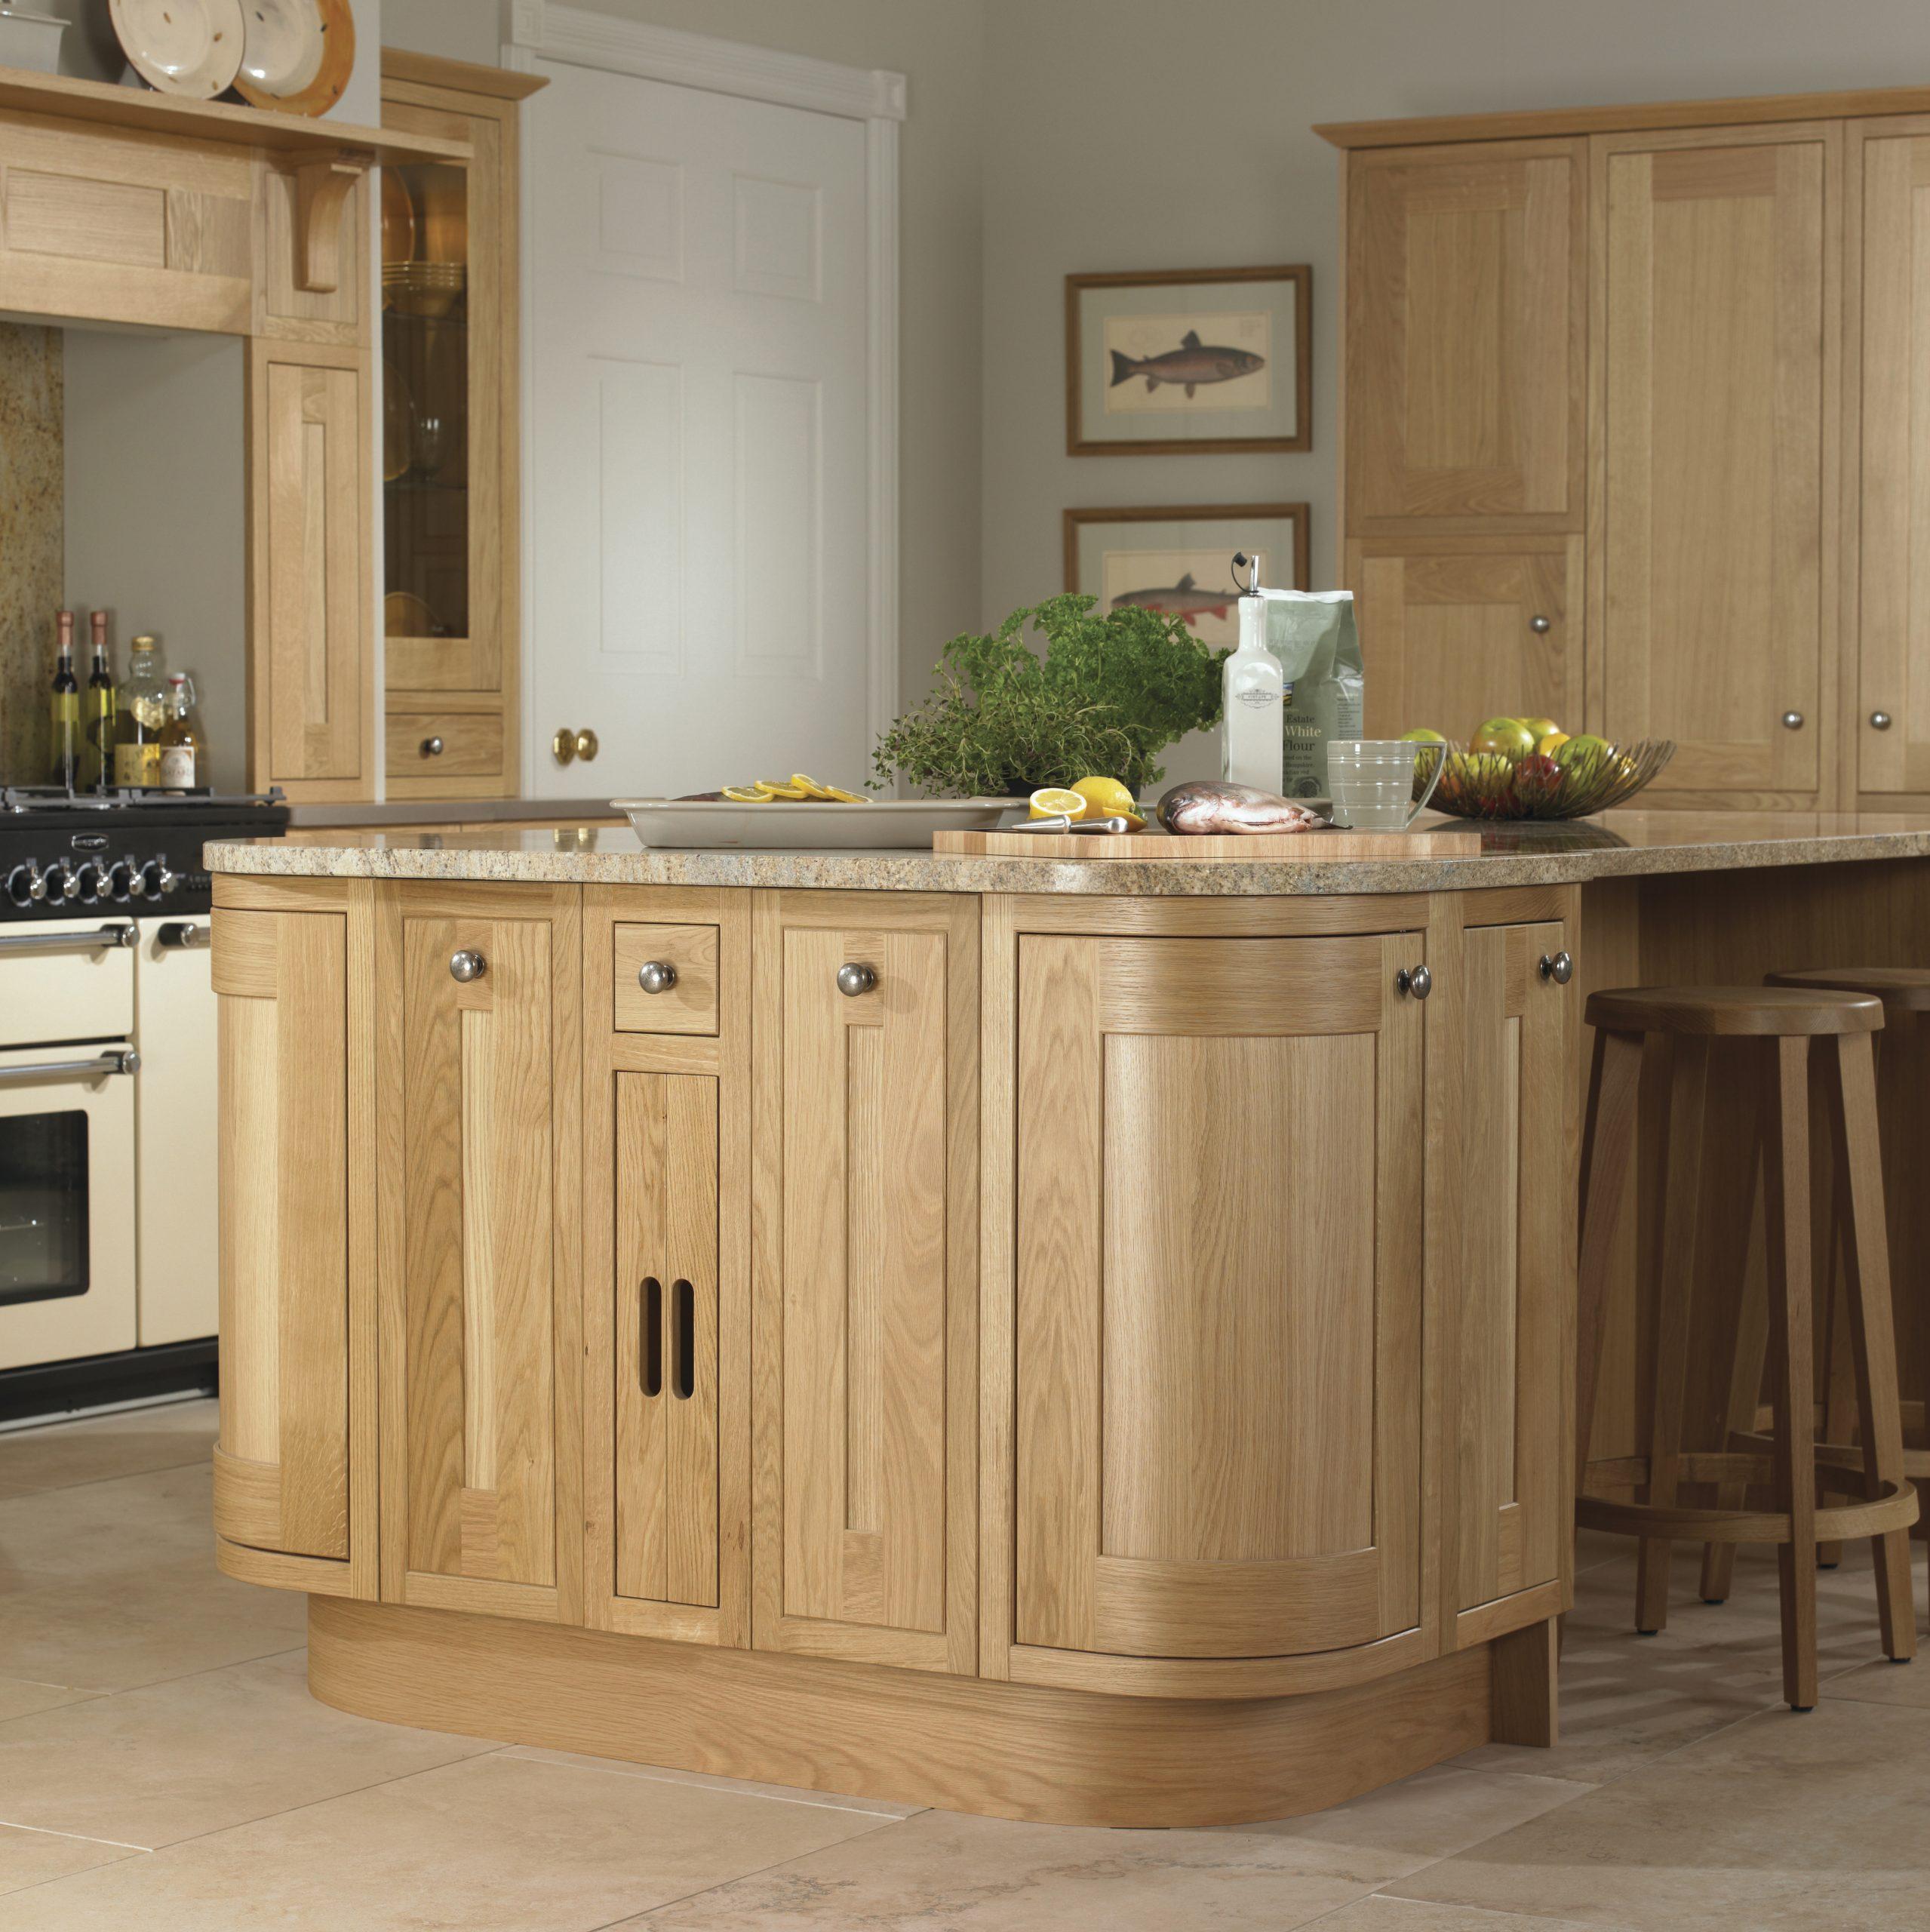 Petworth Natural Oak kitchen